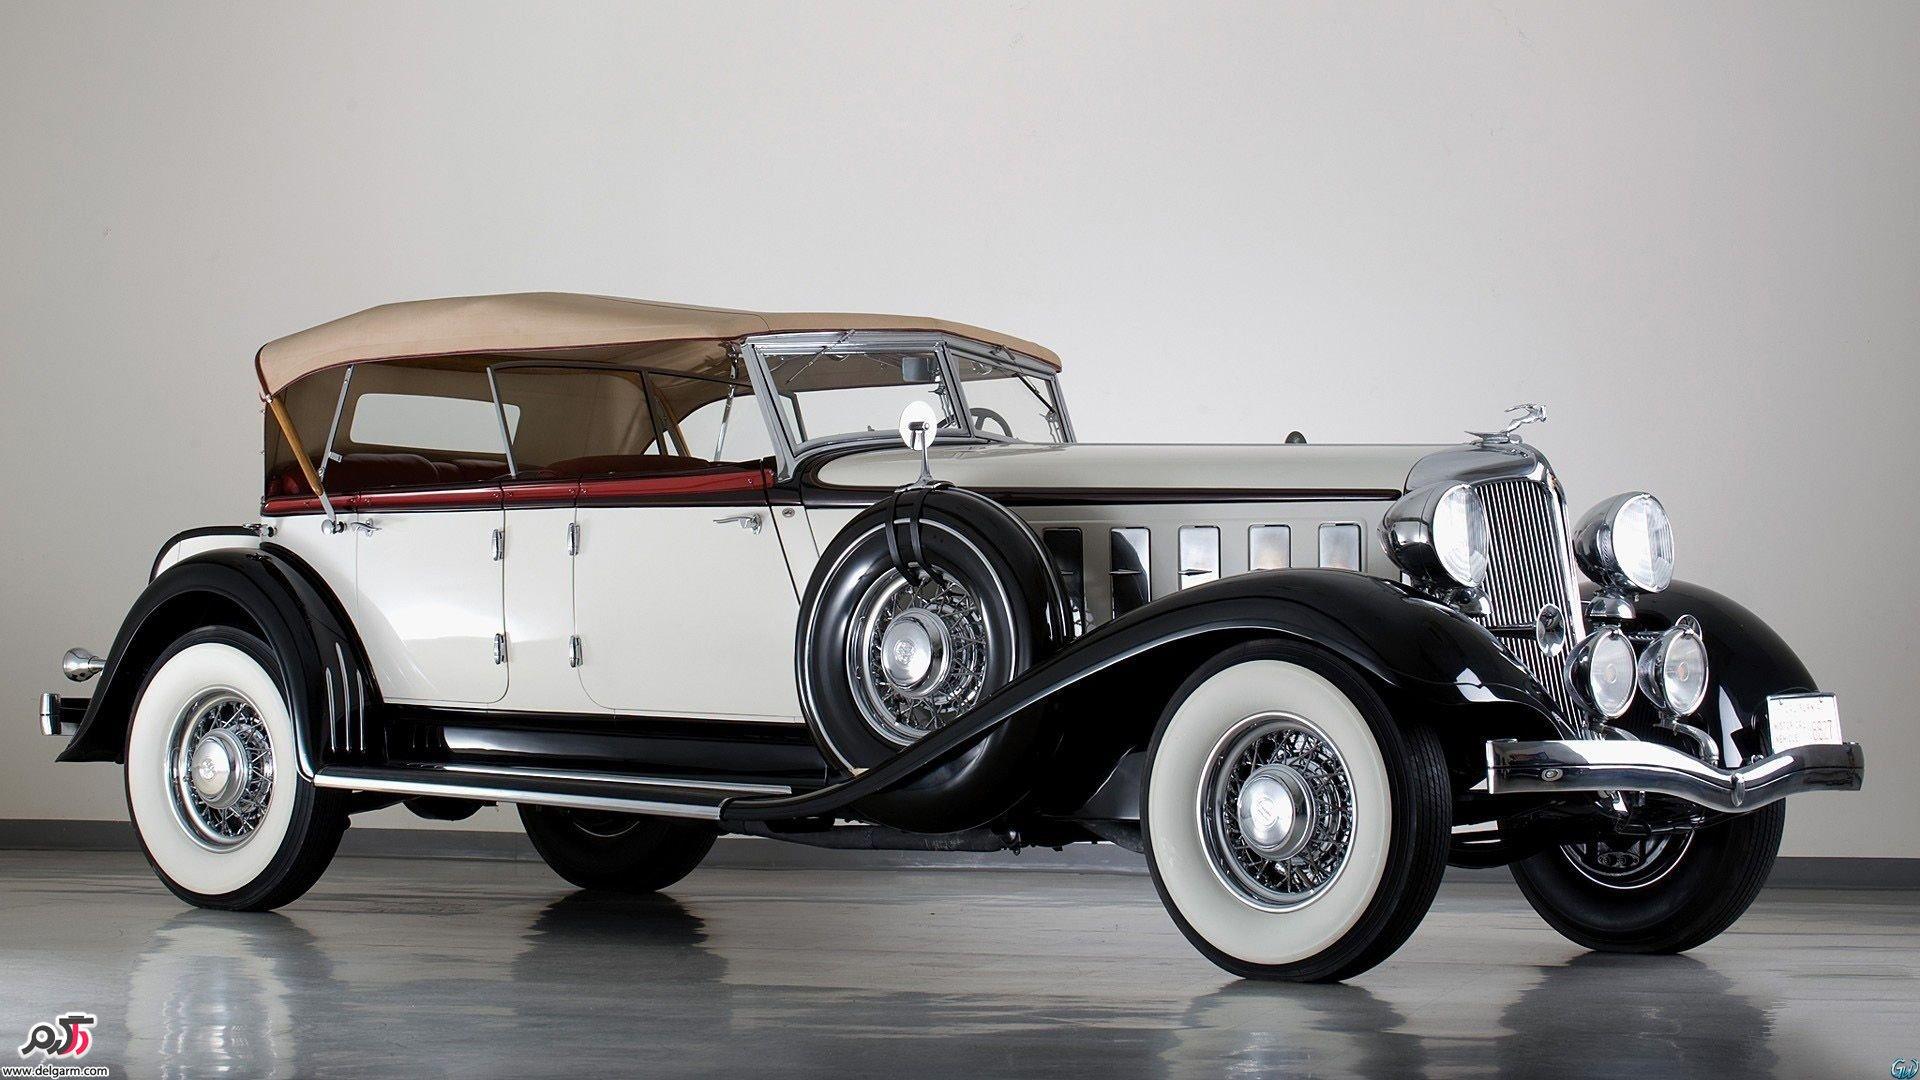 ماشین کلاسیک